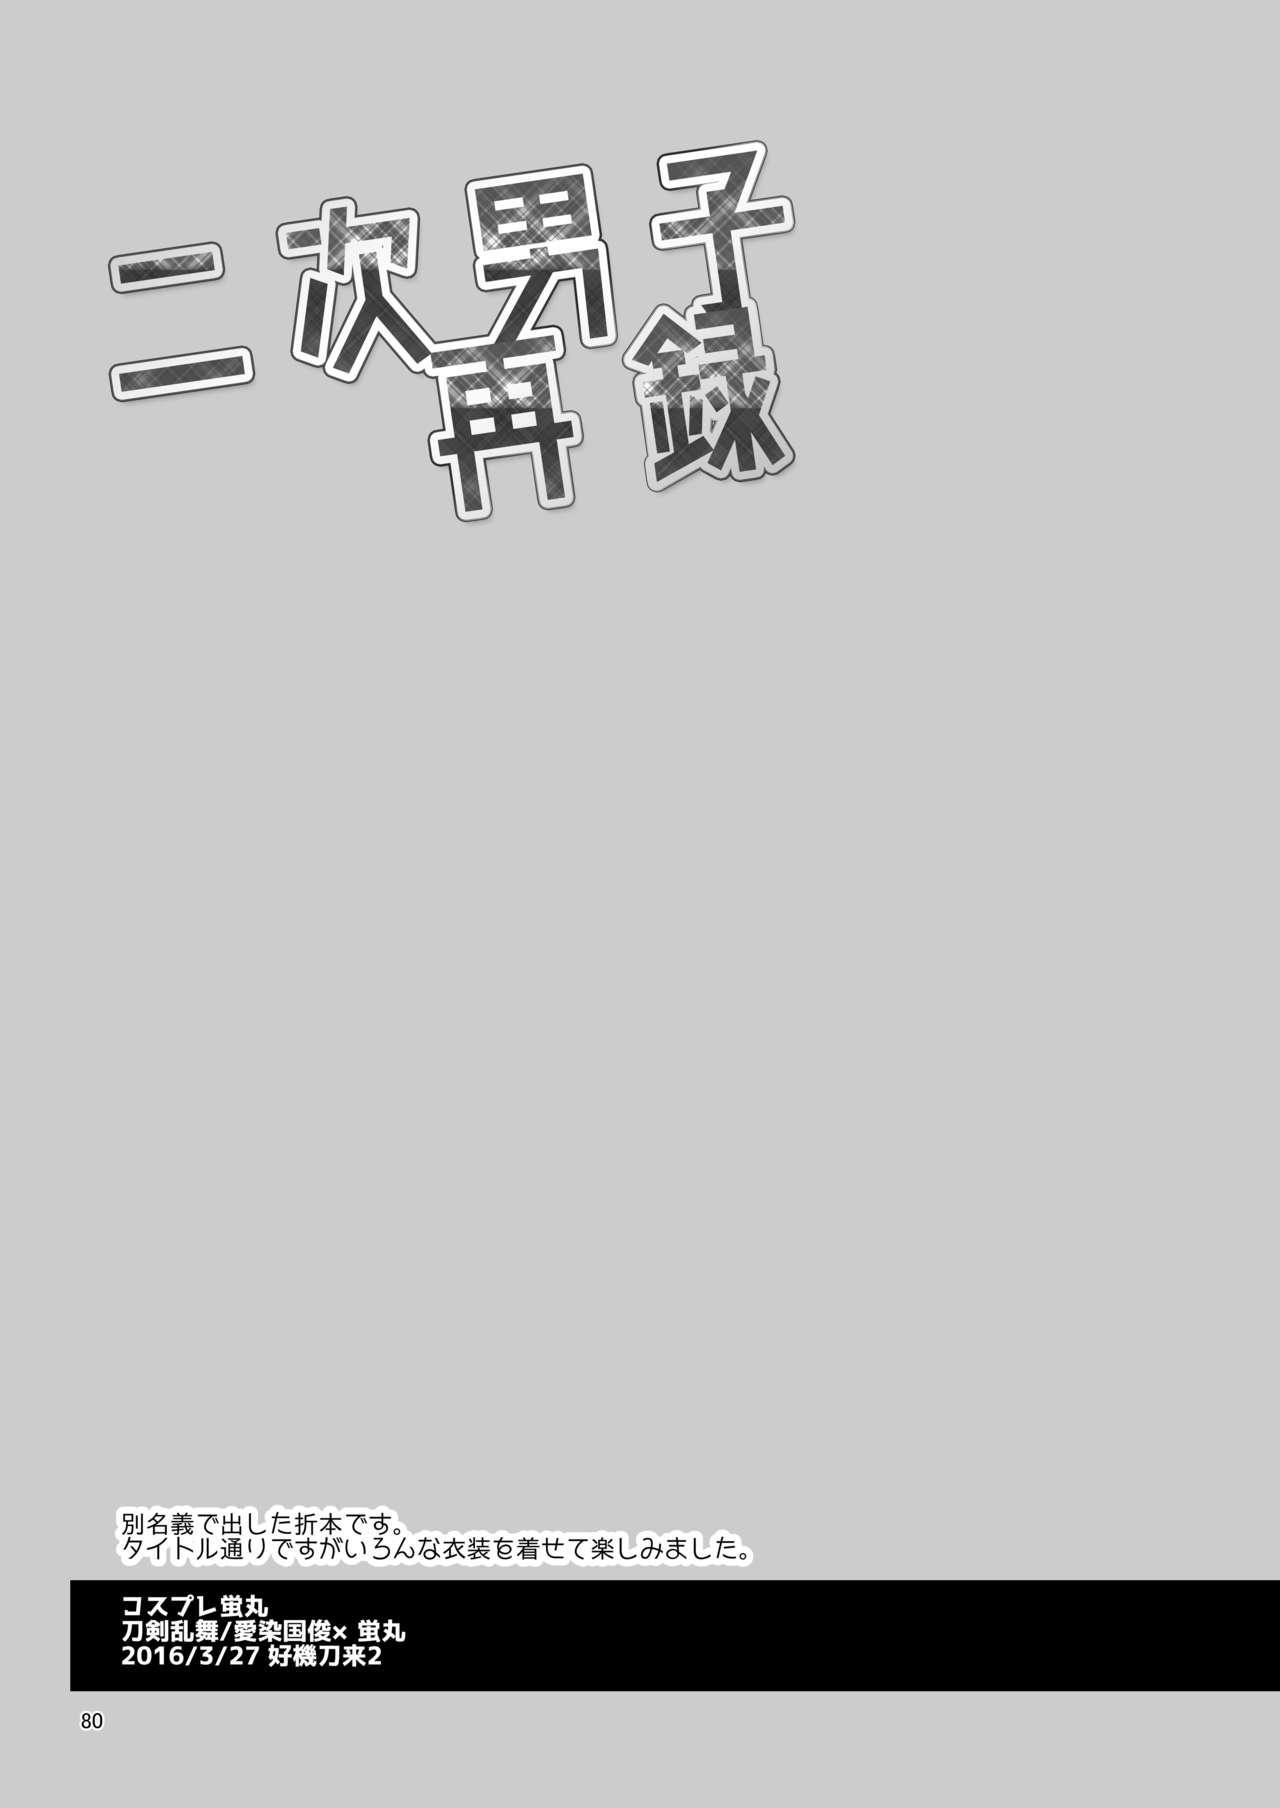 Niji Danshi Rerelease 80